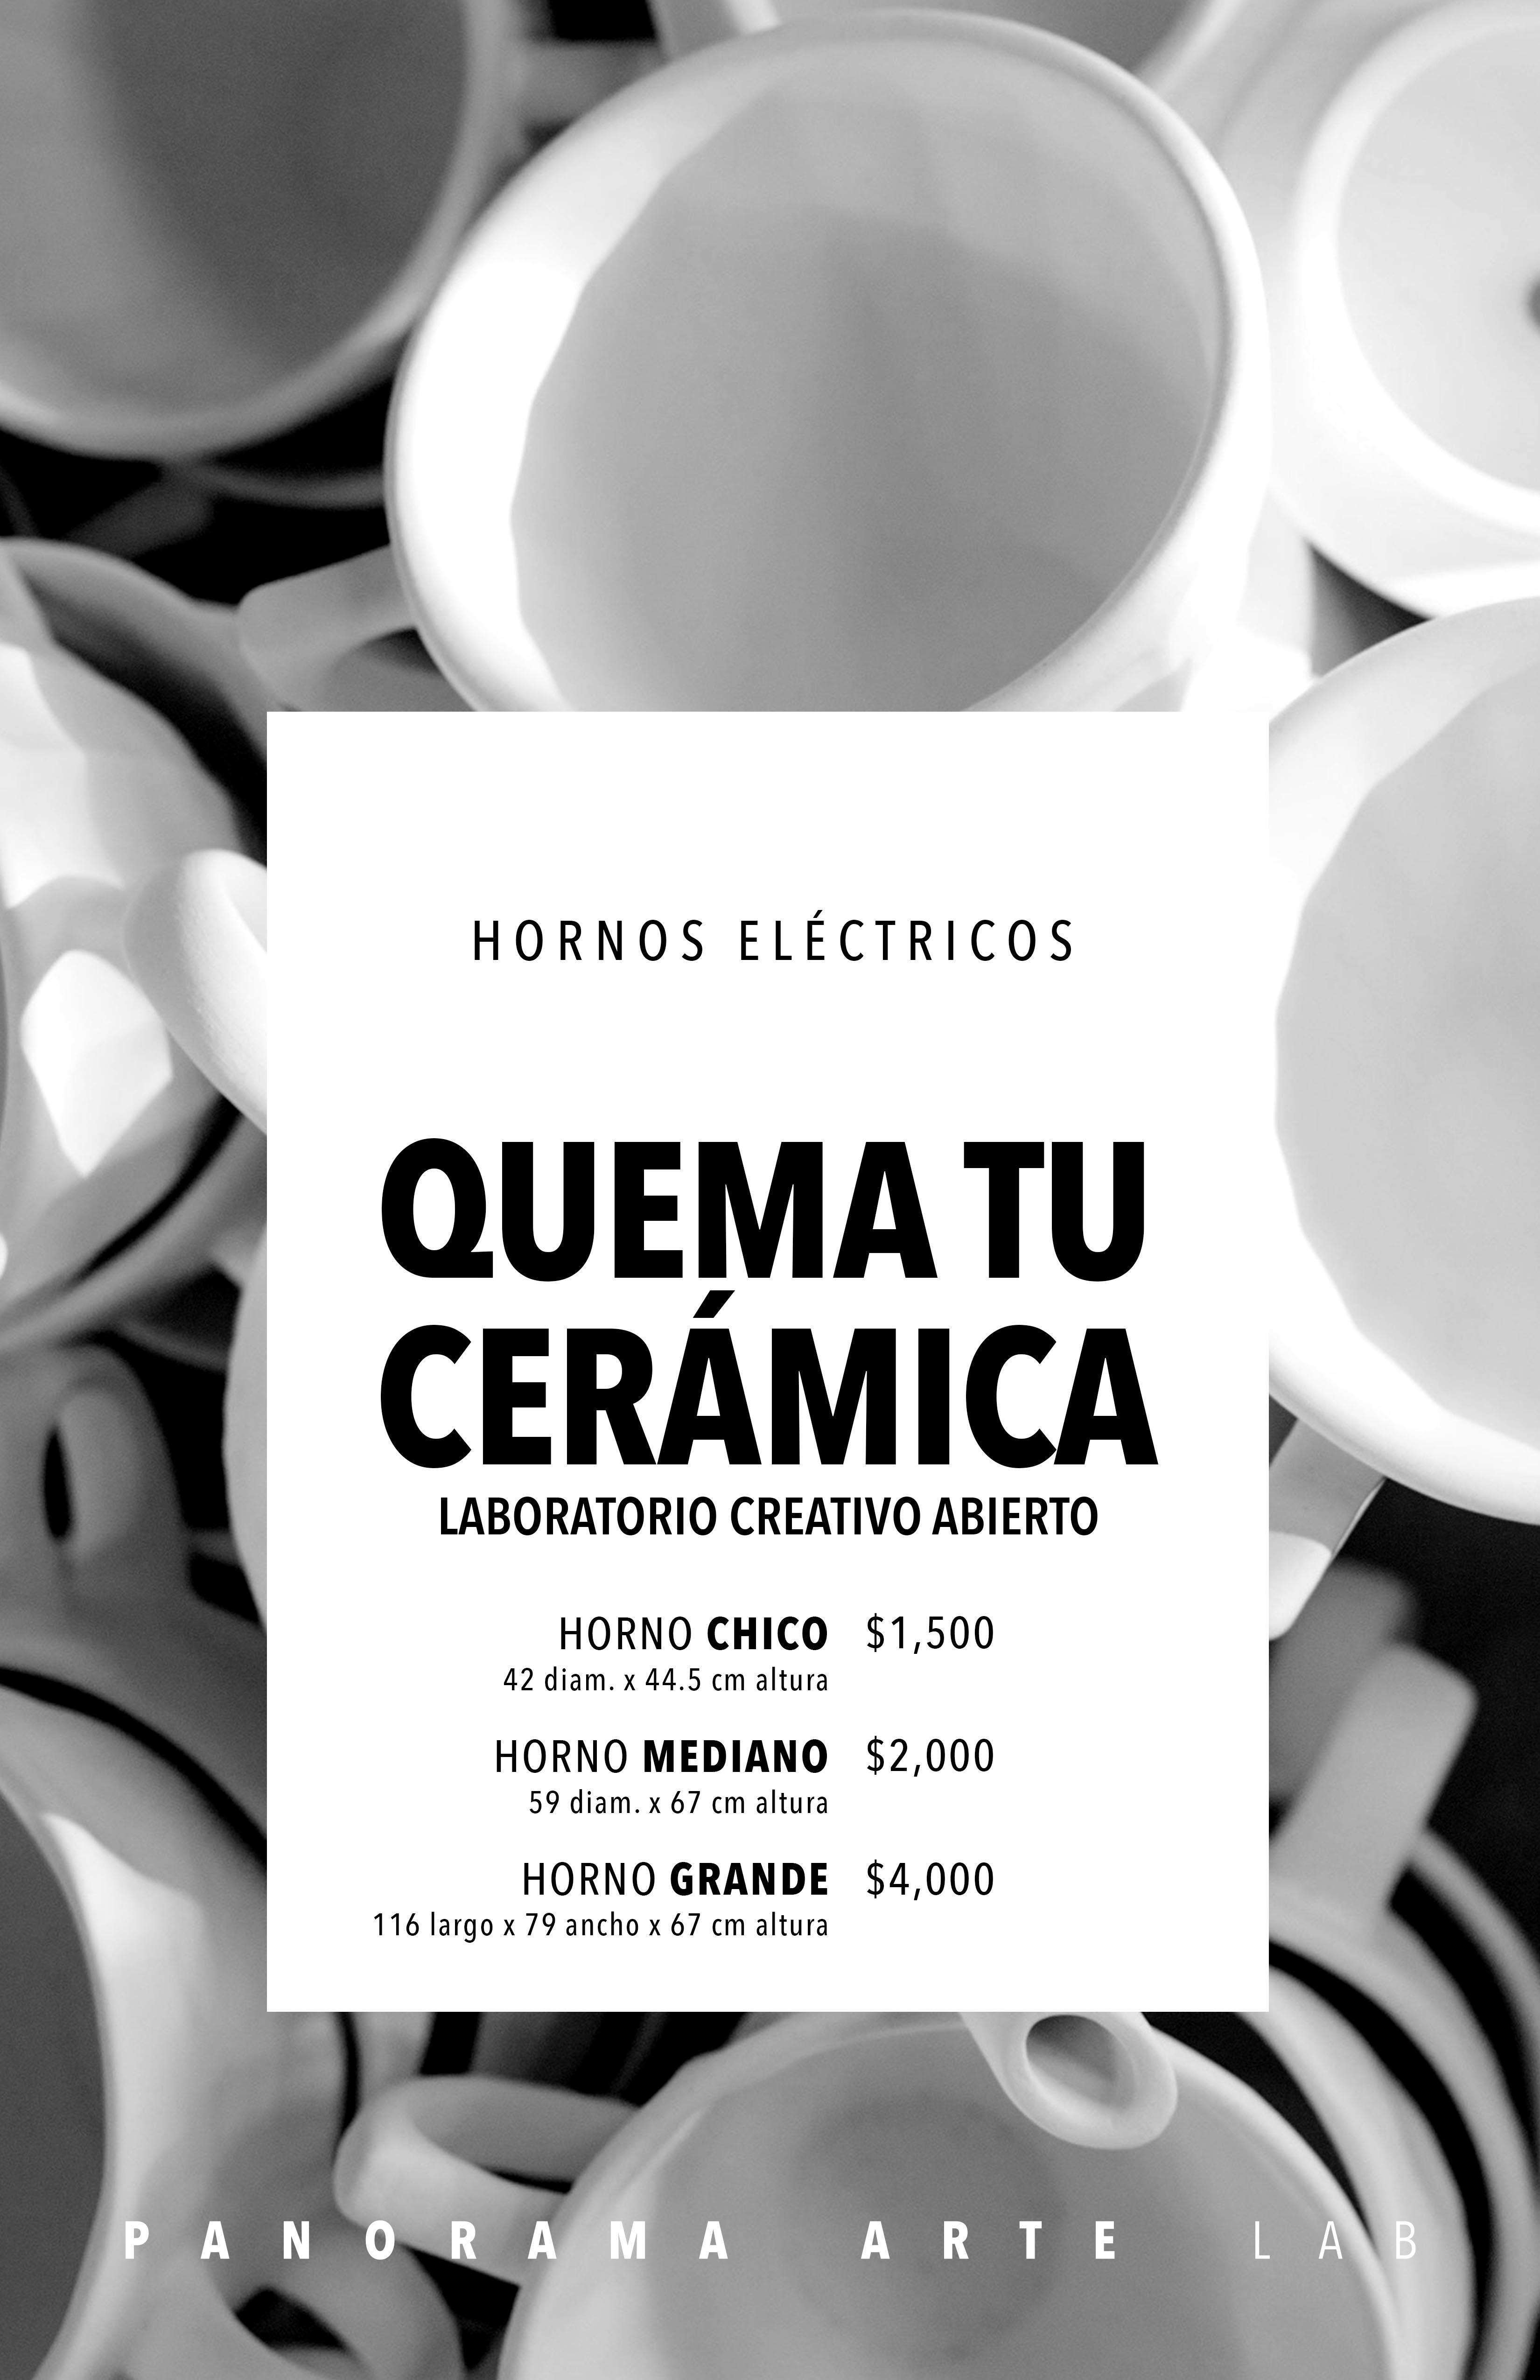 HORNOS ELÉCTRICOS